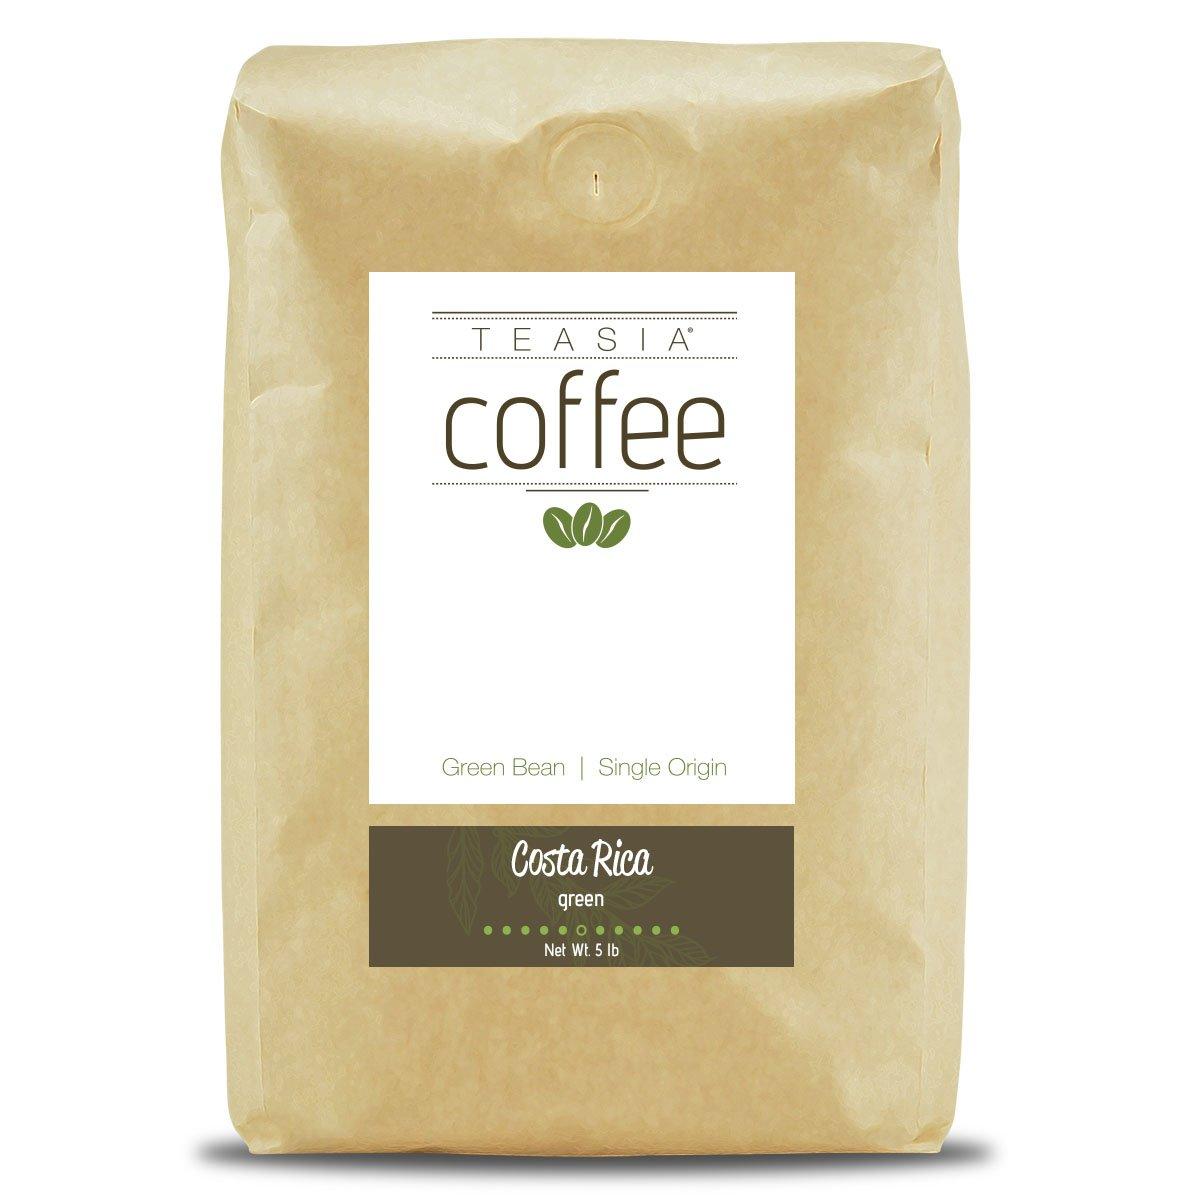 Teasia Coffee, Costa Rica, Single Origin, Green Unroasted Whole Coffee Beans, 5-Pound Bag by Teasia